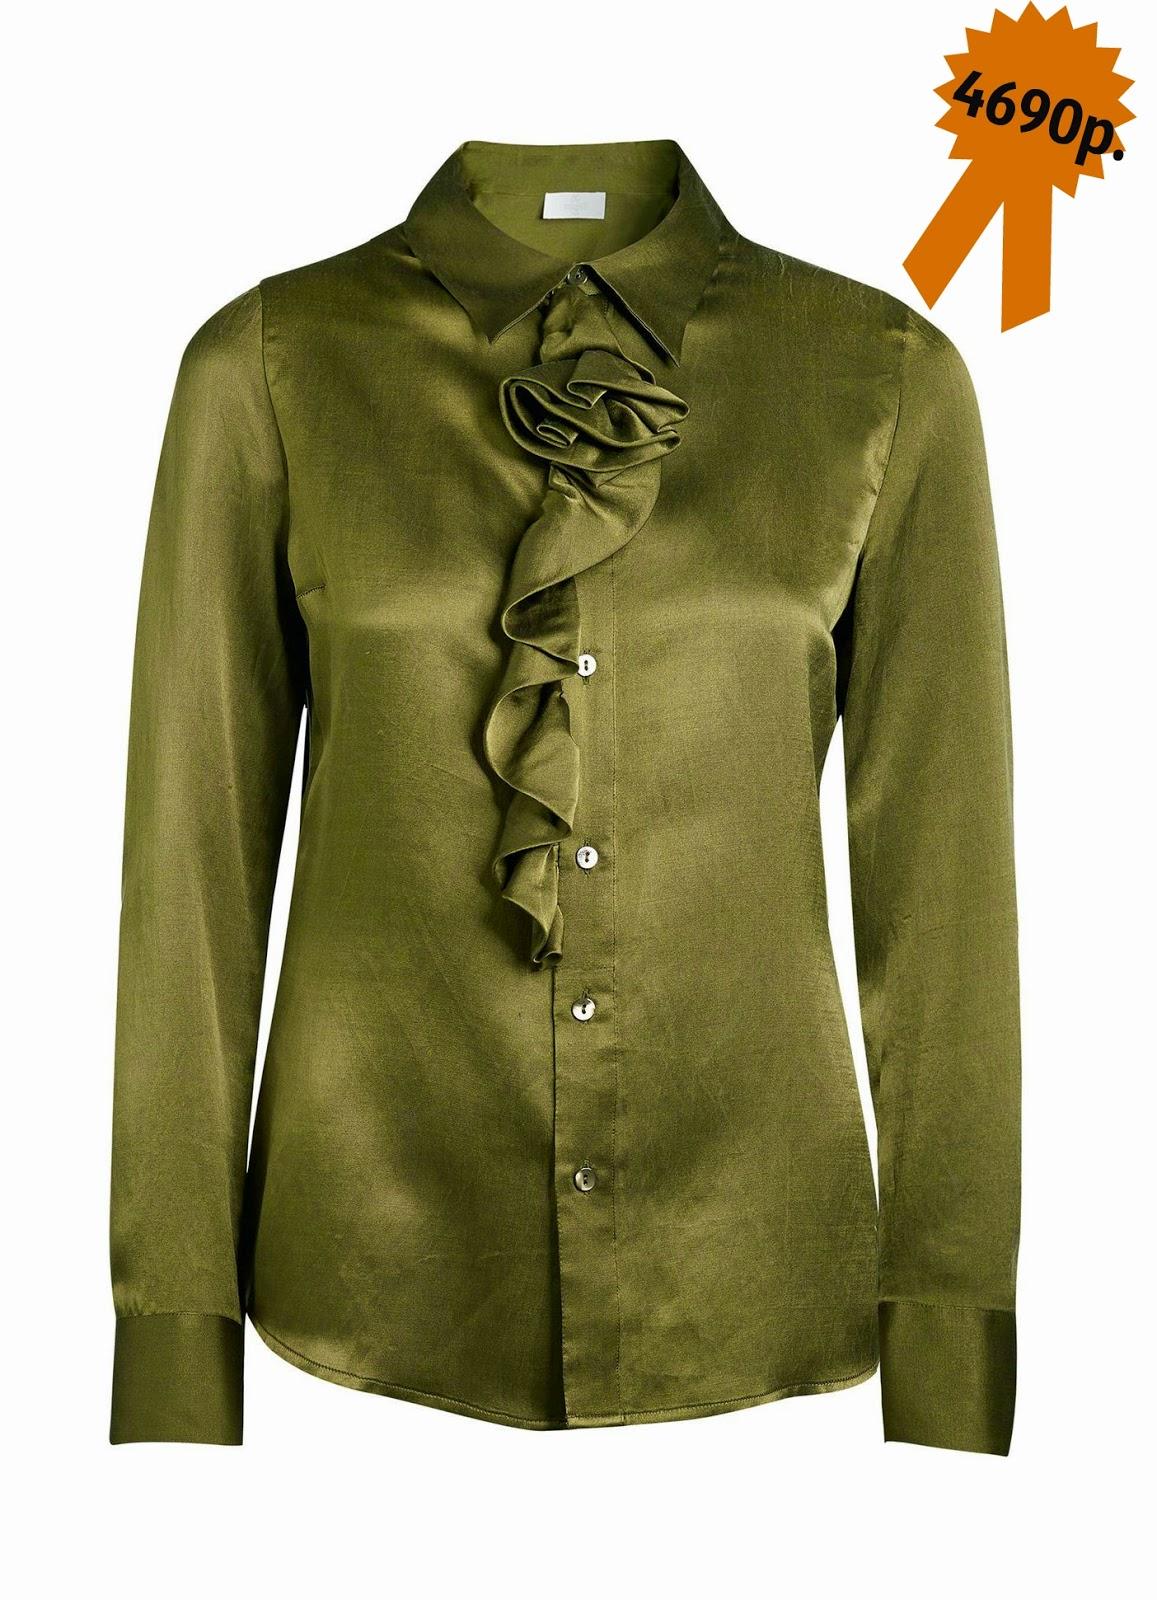 Рубашка с жабо Elegance ретро стиль